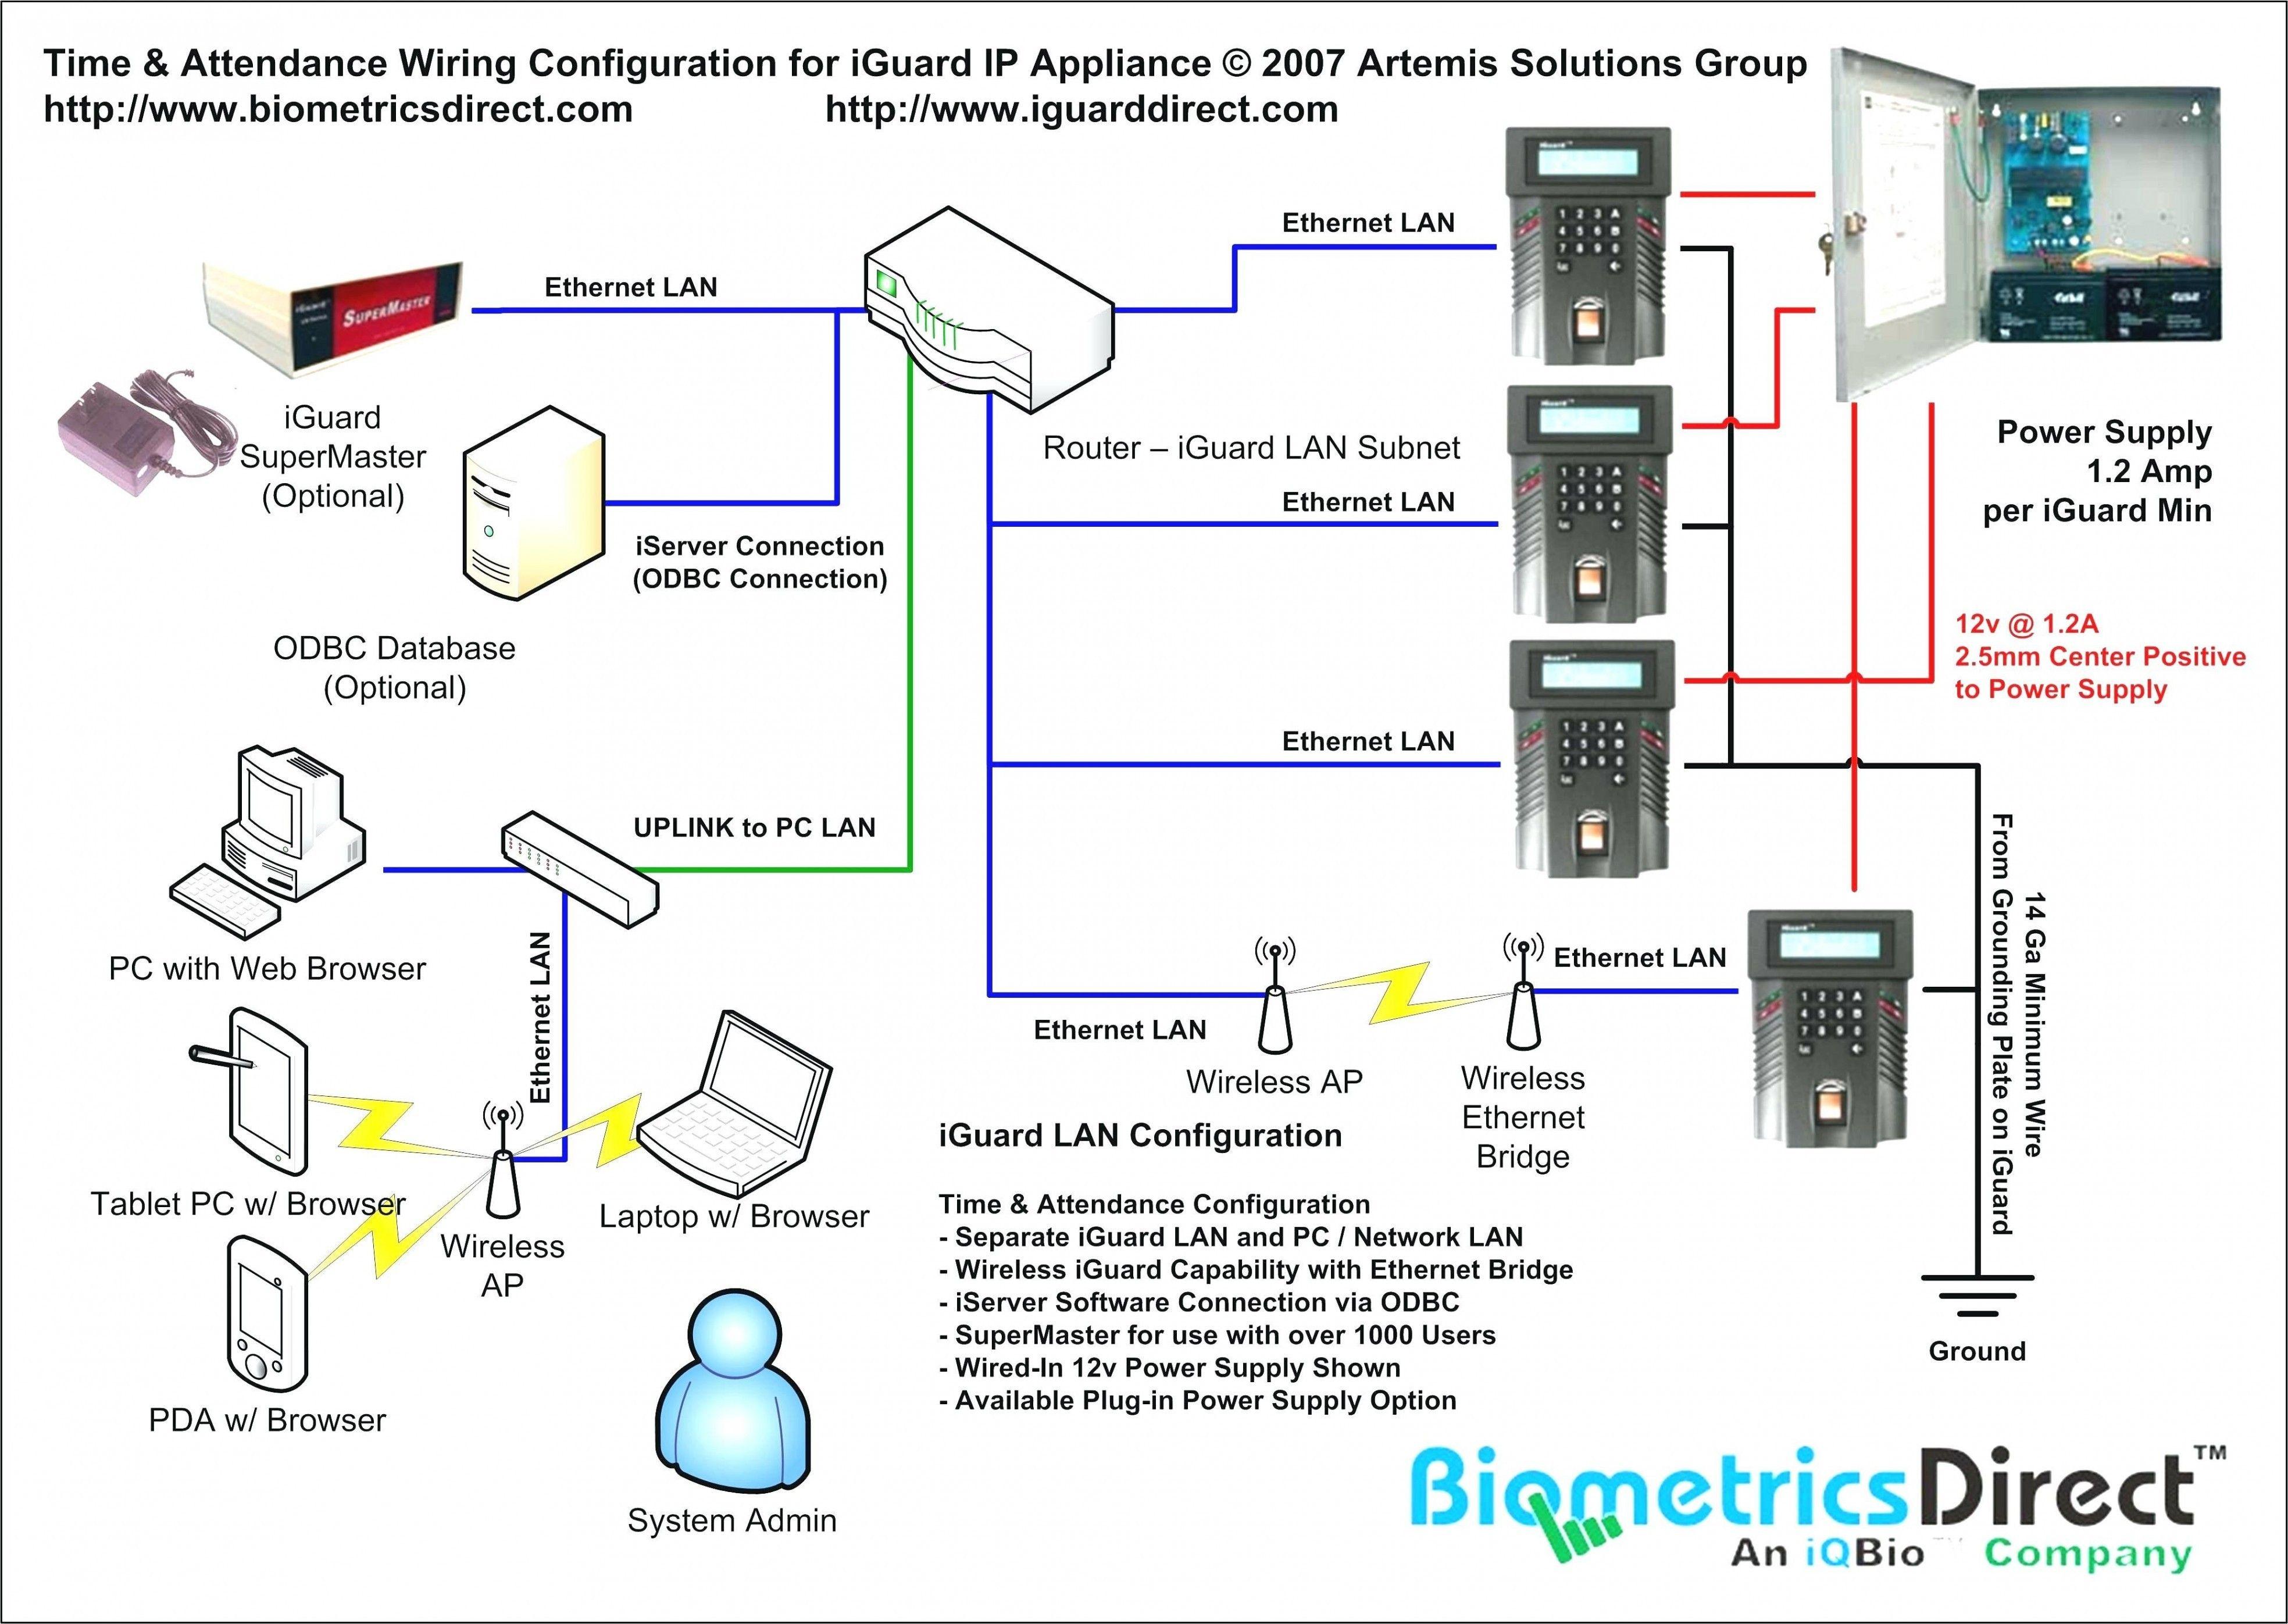 Unique Wiring Diagram App Diagram Wiringdiagram Diagramming Diagramm Visuals Visualisation Graphical Che Diagram Electrical Circuit Diagram House Wiring